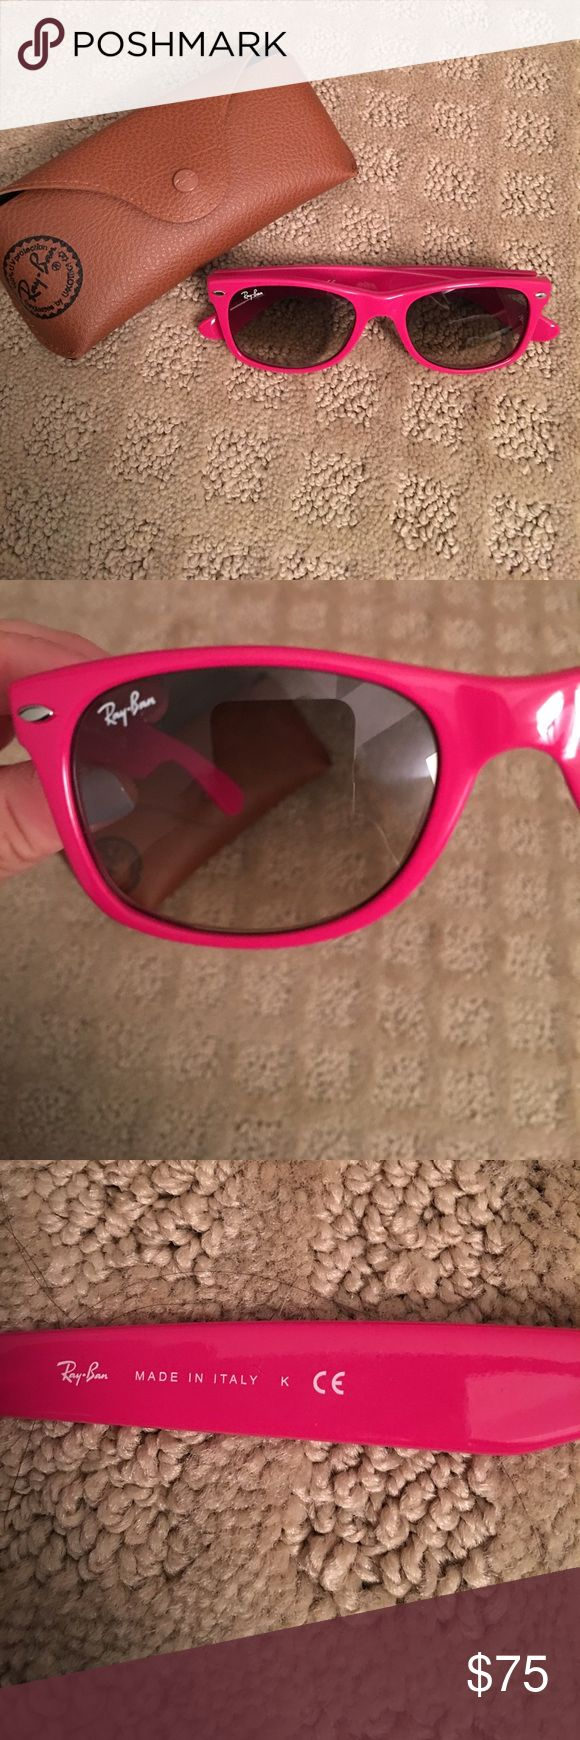 Ray Ban Wayfarer Hot pink Ray Ban wayfarer. Never worn with case. Women's fit. Ray-Ban Accessories Sunglasses